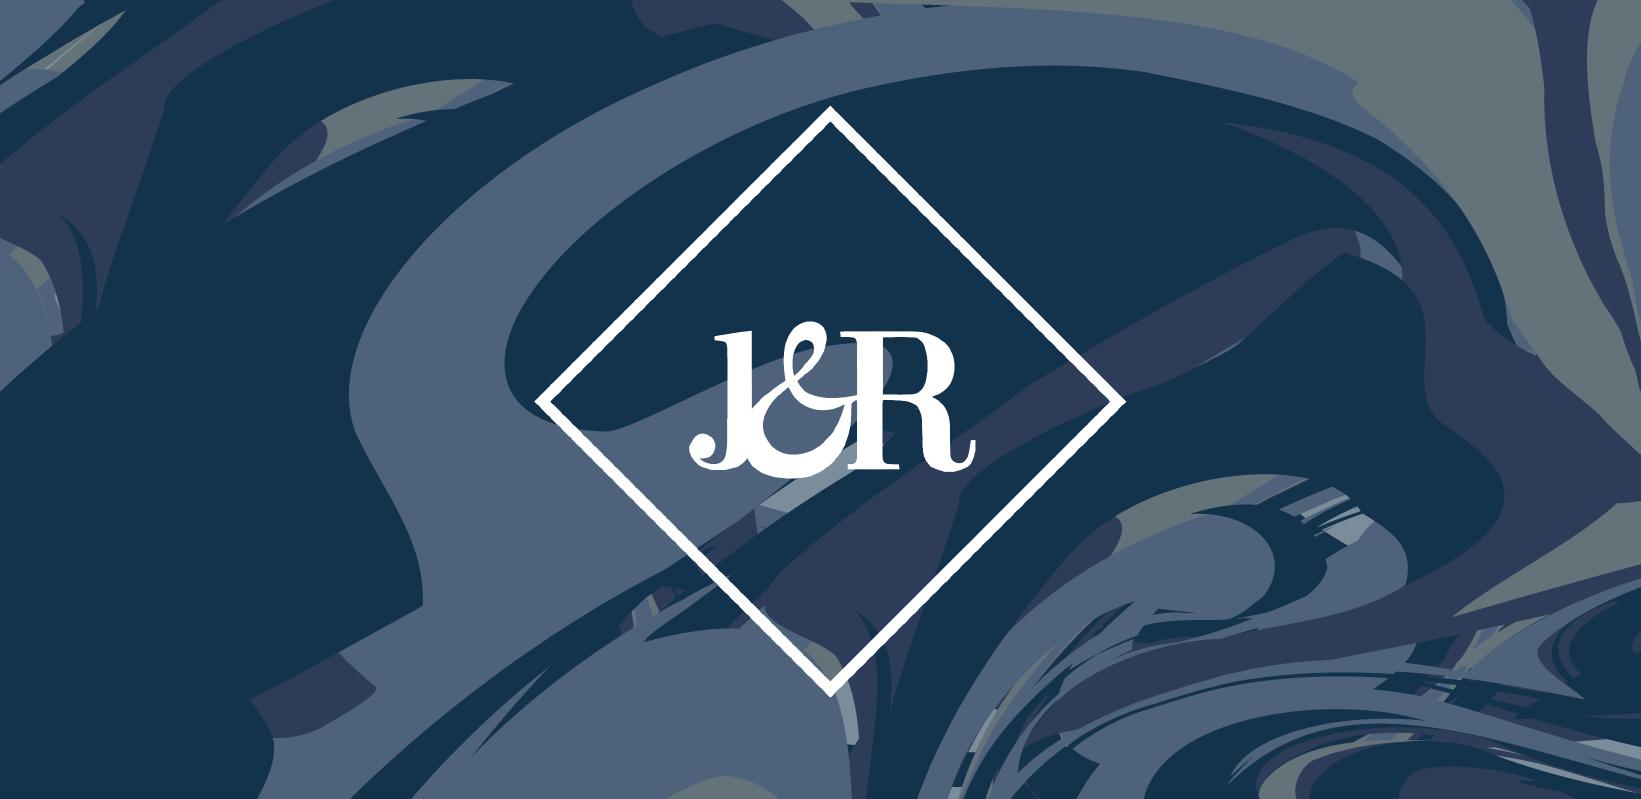 photography-logo-branding-jr-photography